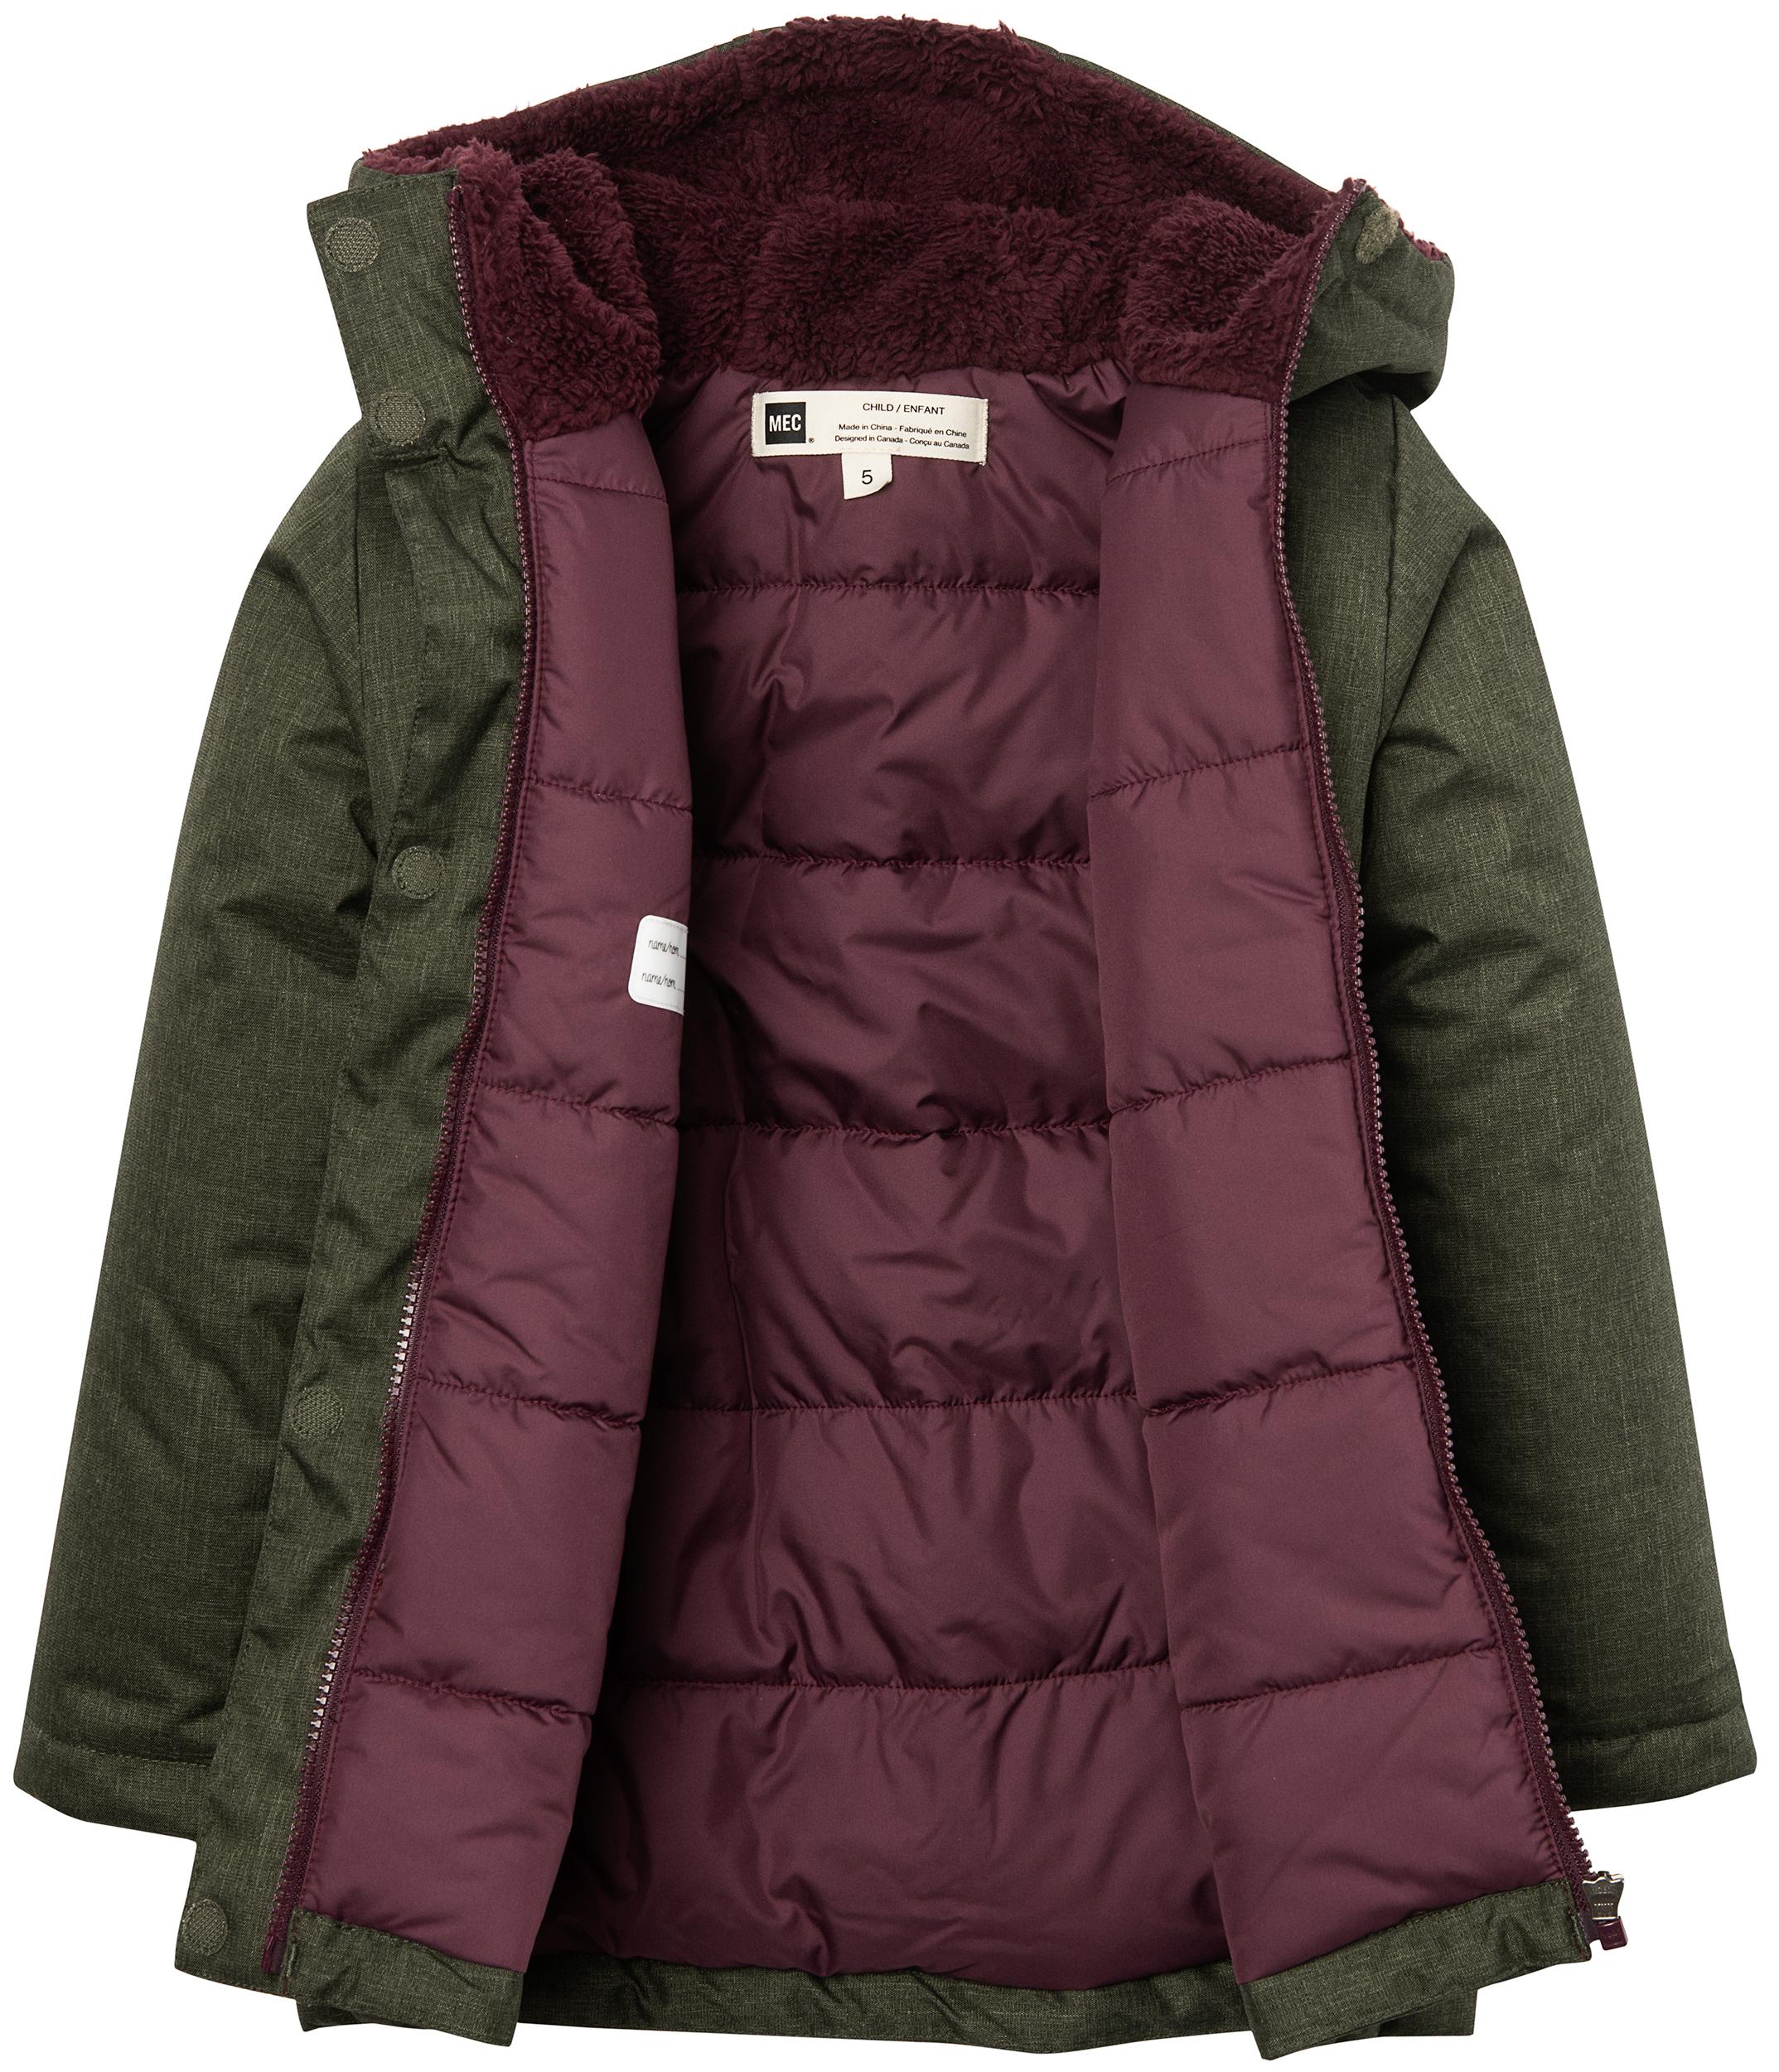 MEC Snowcat Jacket - Children